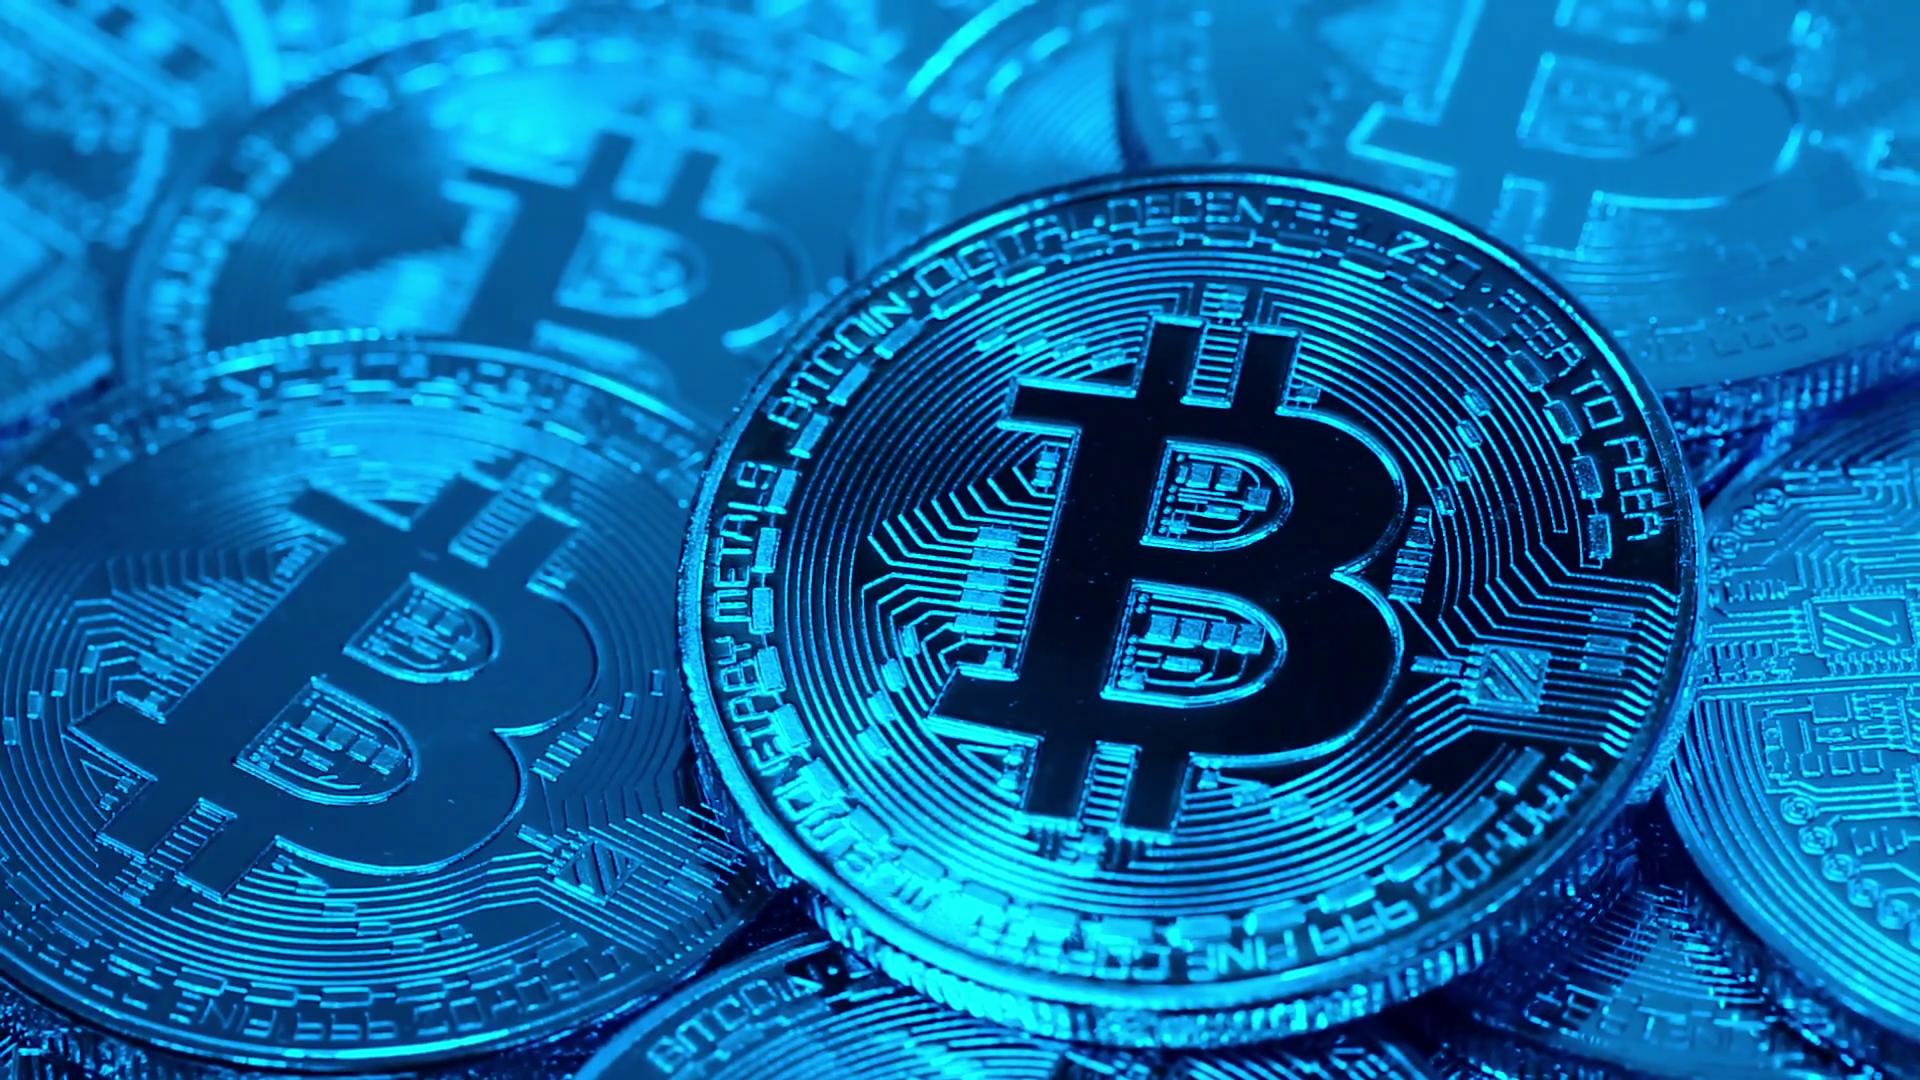 Bitcoin Blue 1920x1080 Wallpaper Teahub Io